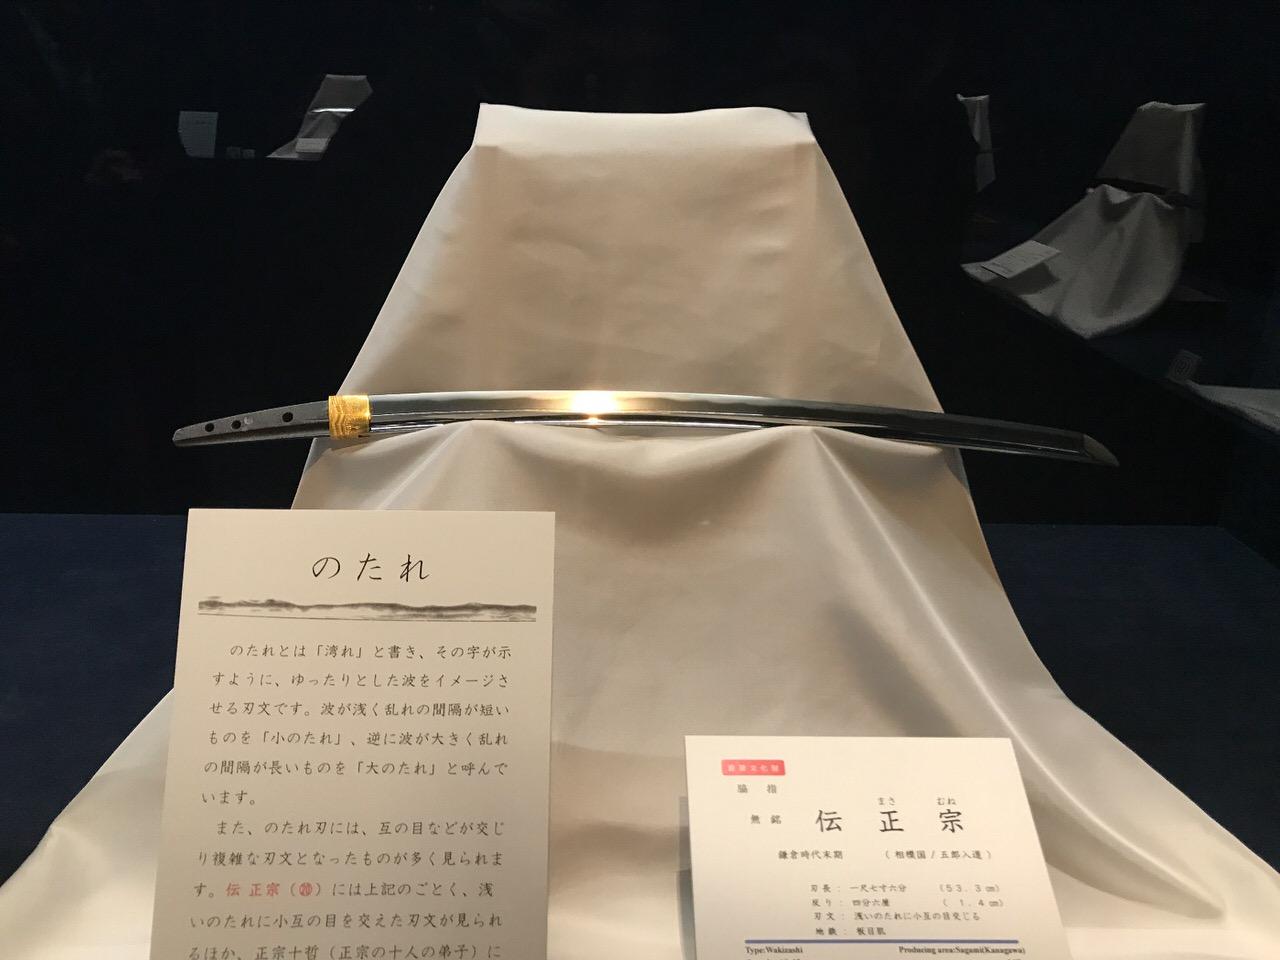 Mori shuusui 1352